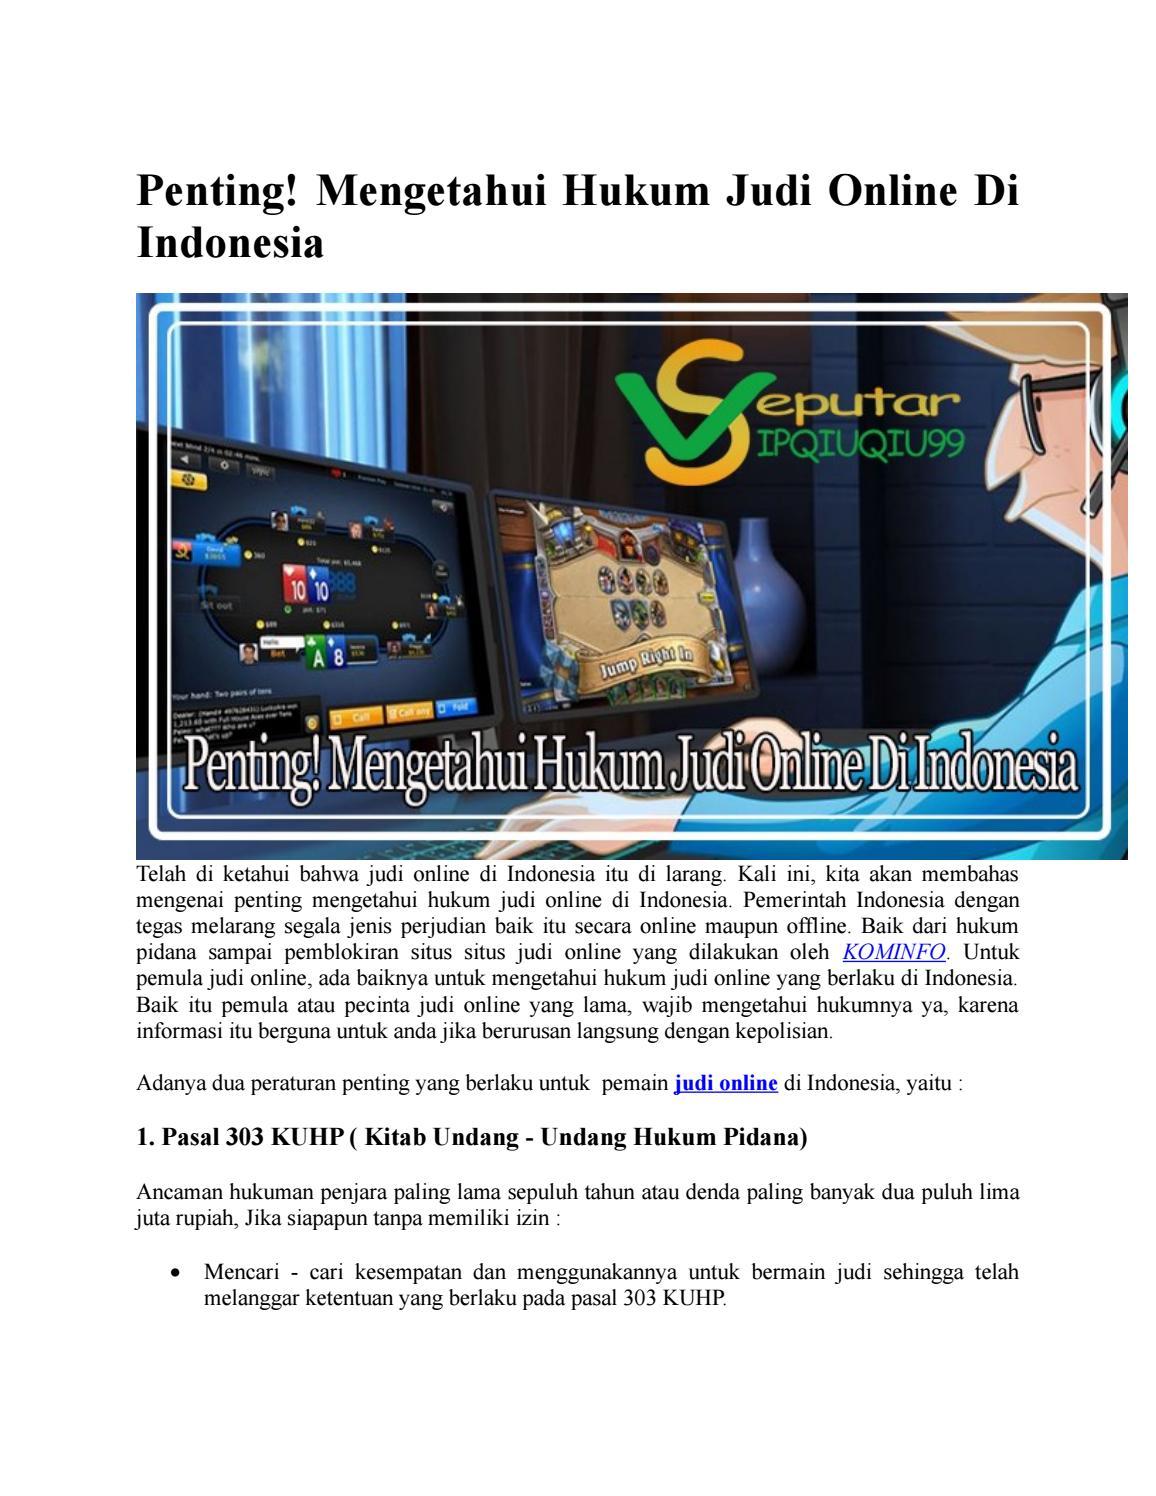 Penting Mengetahui Hukum Judi Online Di Indonesia By Seputarvipqiuqiu99 Issuu